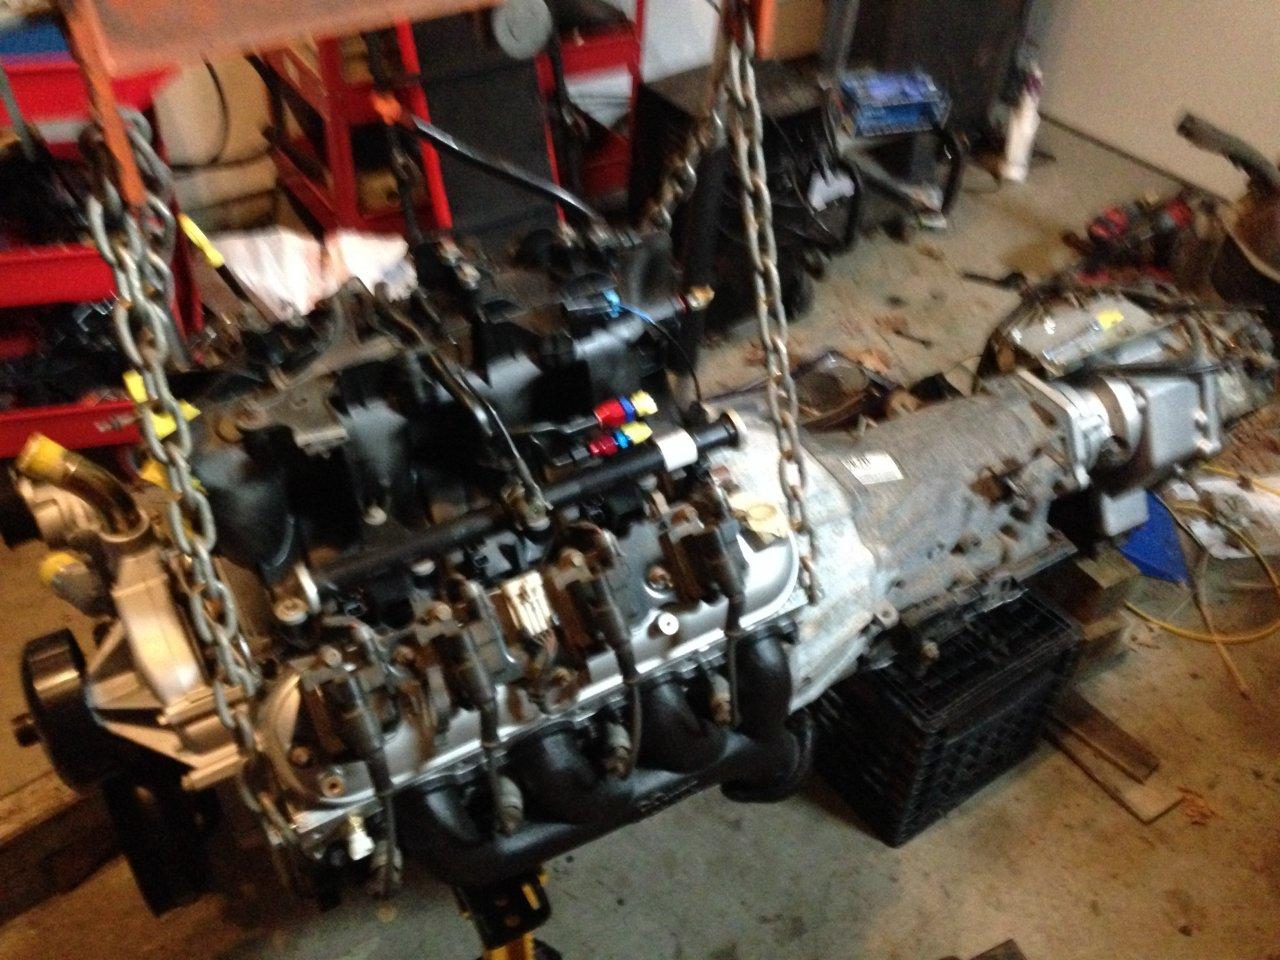 2014 4runner For Sale >> For Sale - Complete LS Swap LQ9 Parts   IH8MUD Forum